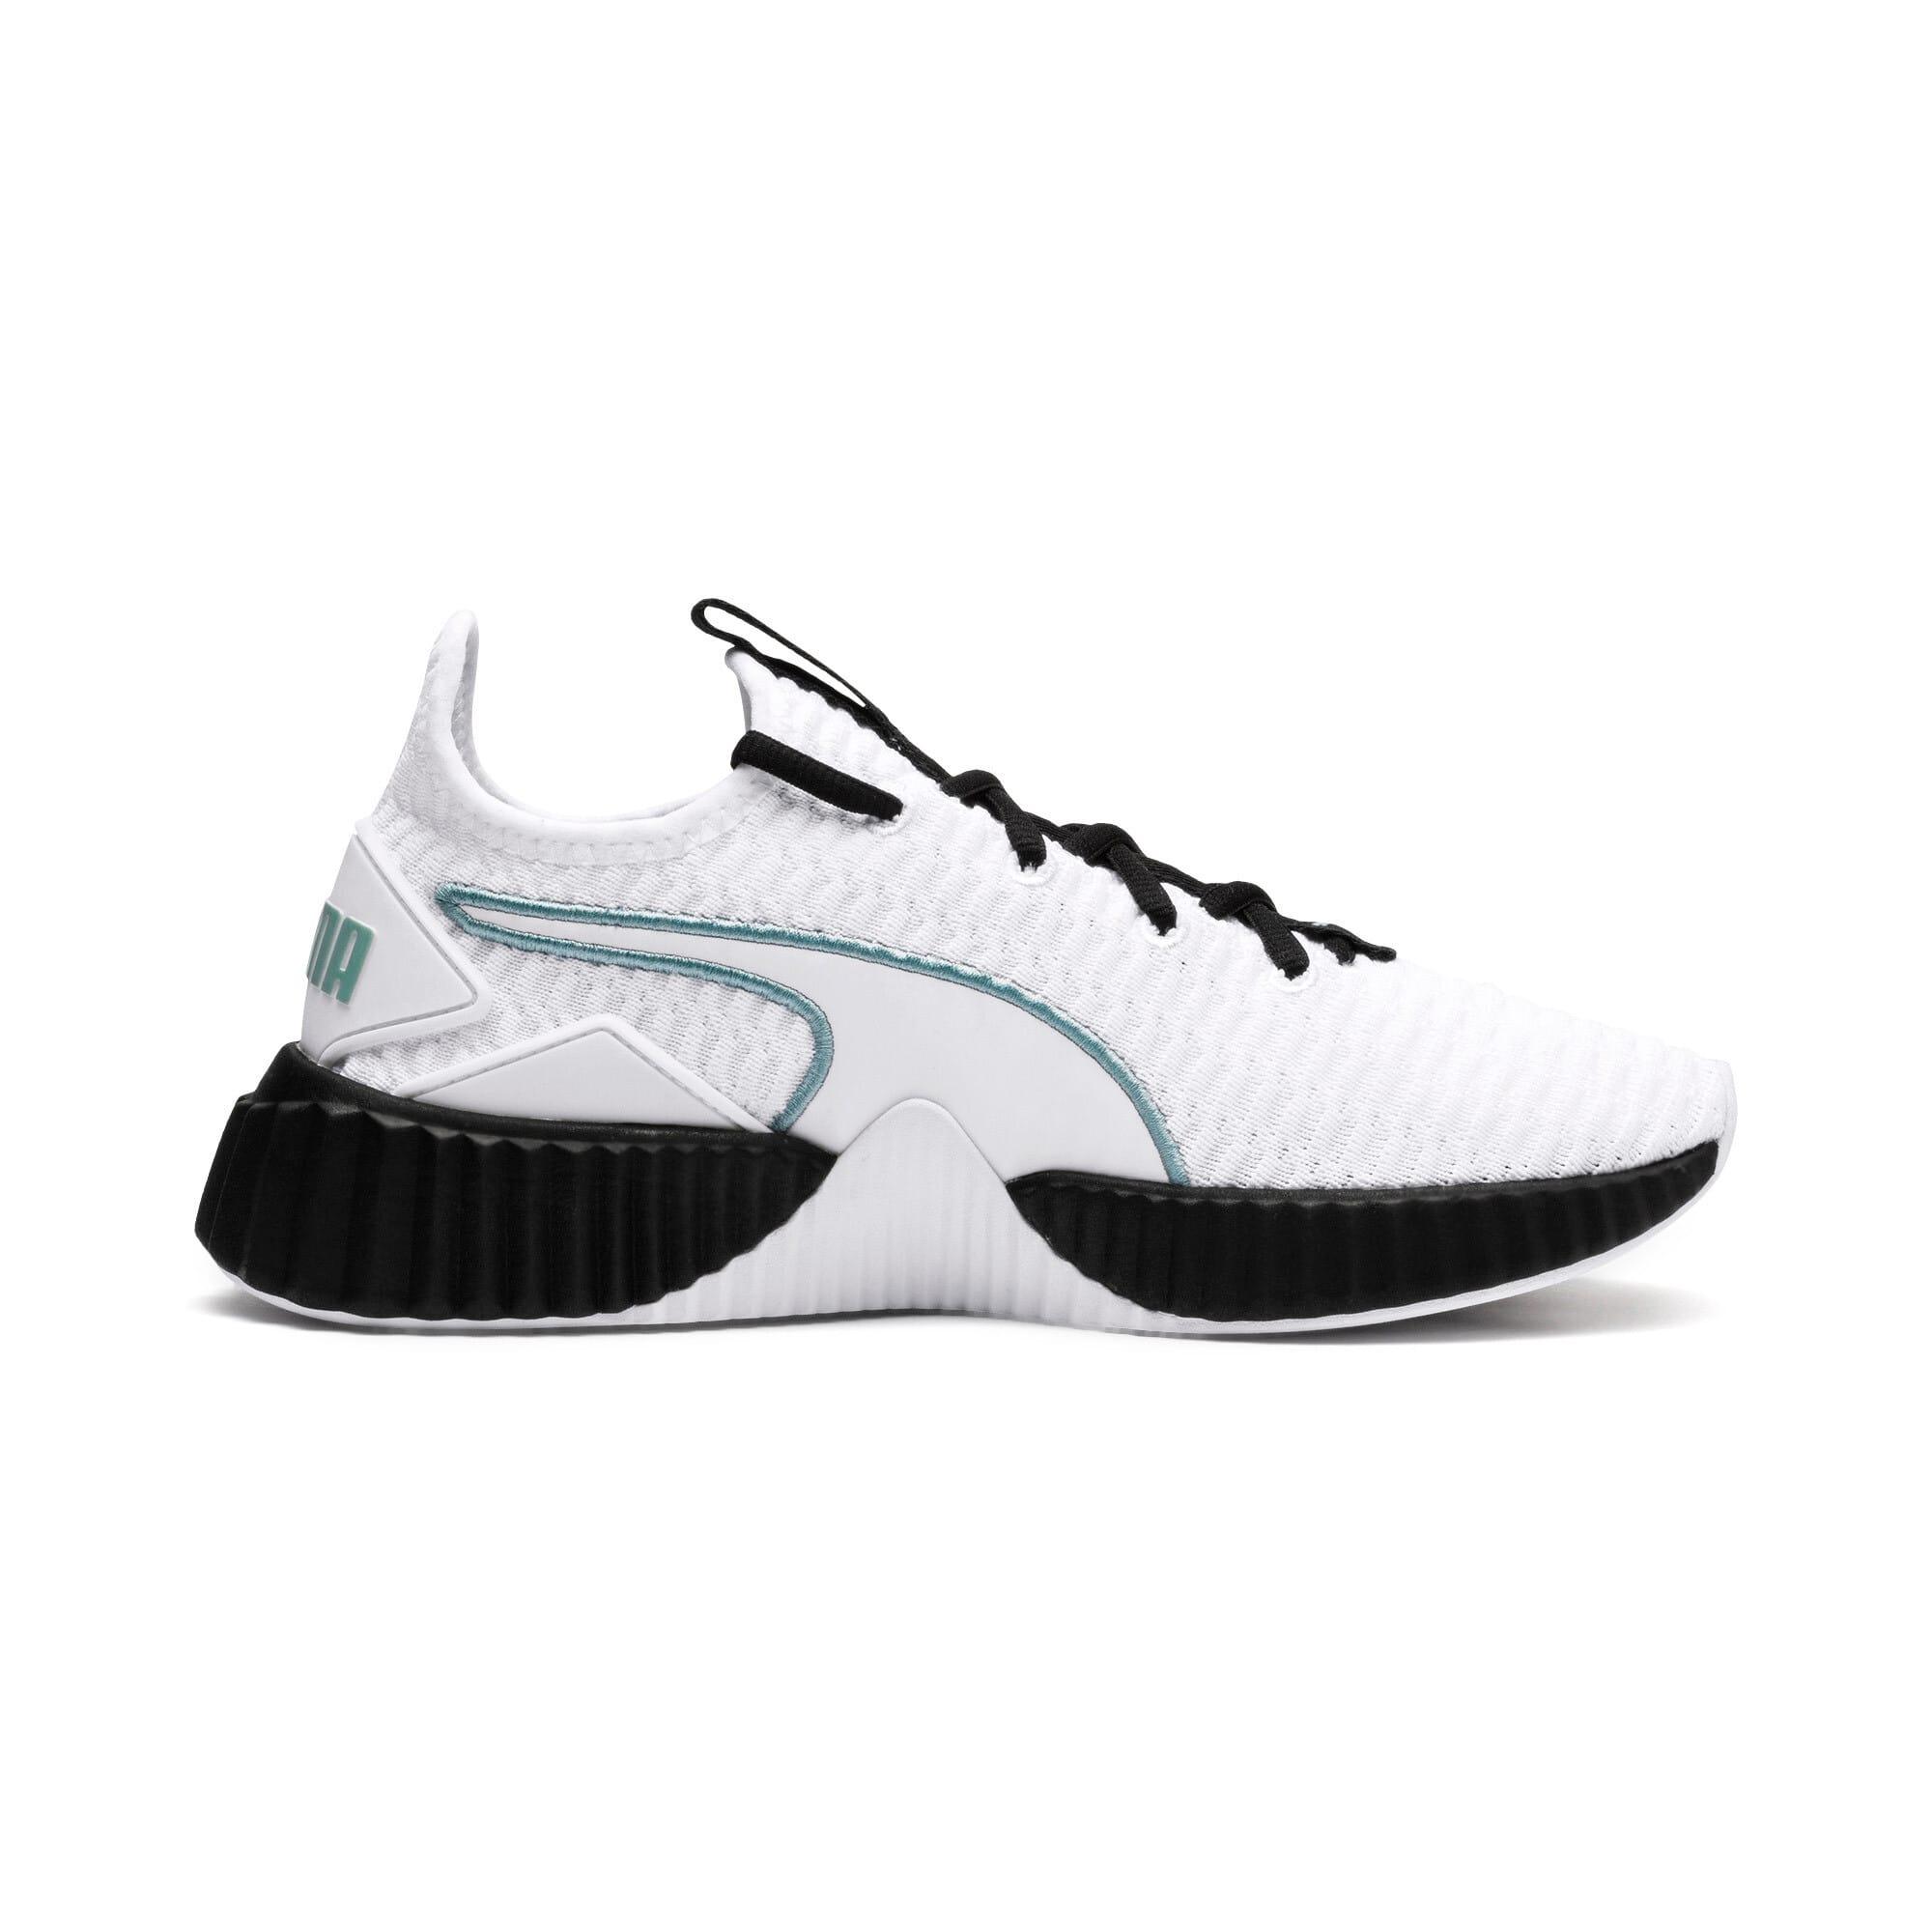 Thumbnail 5 of Defy Damen Sneaker, Puma White-Puma Black, medium